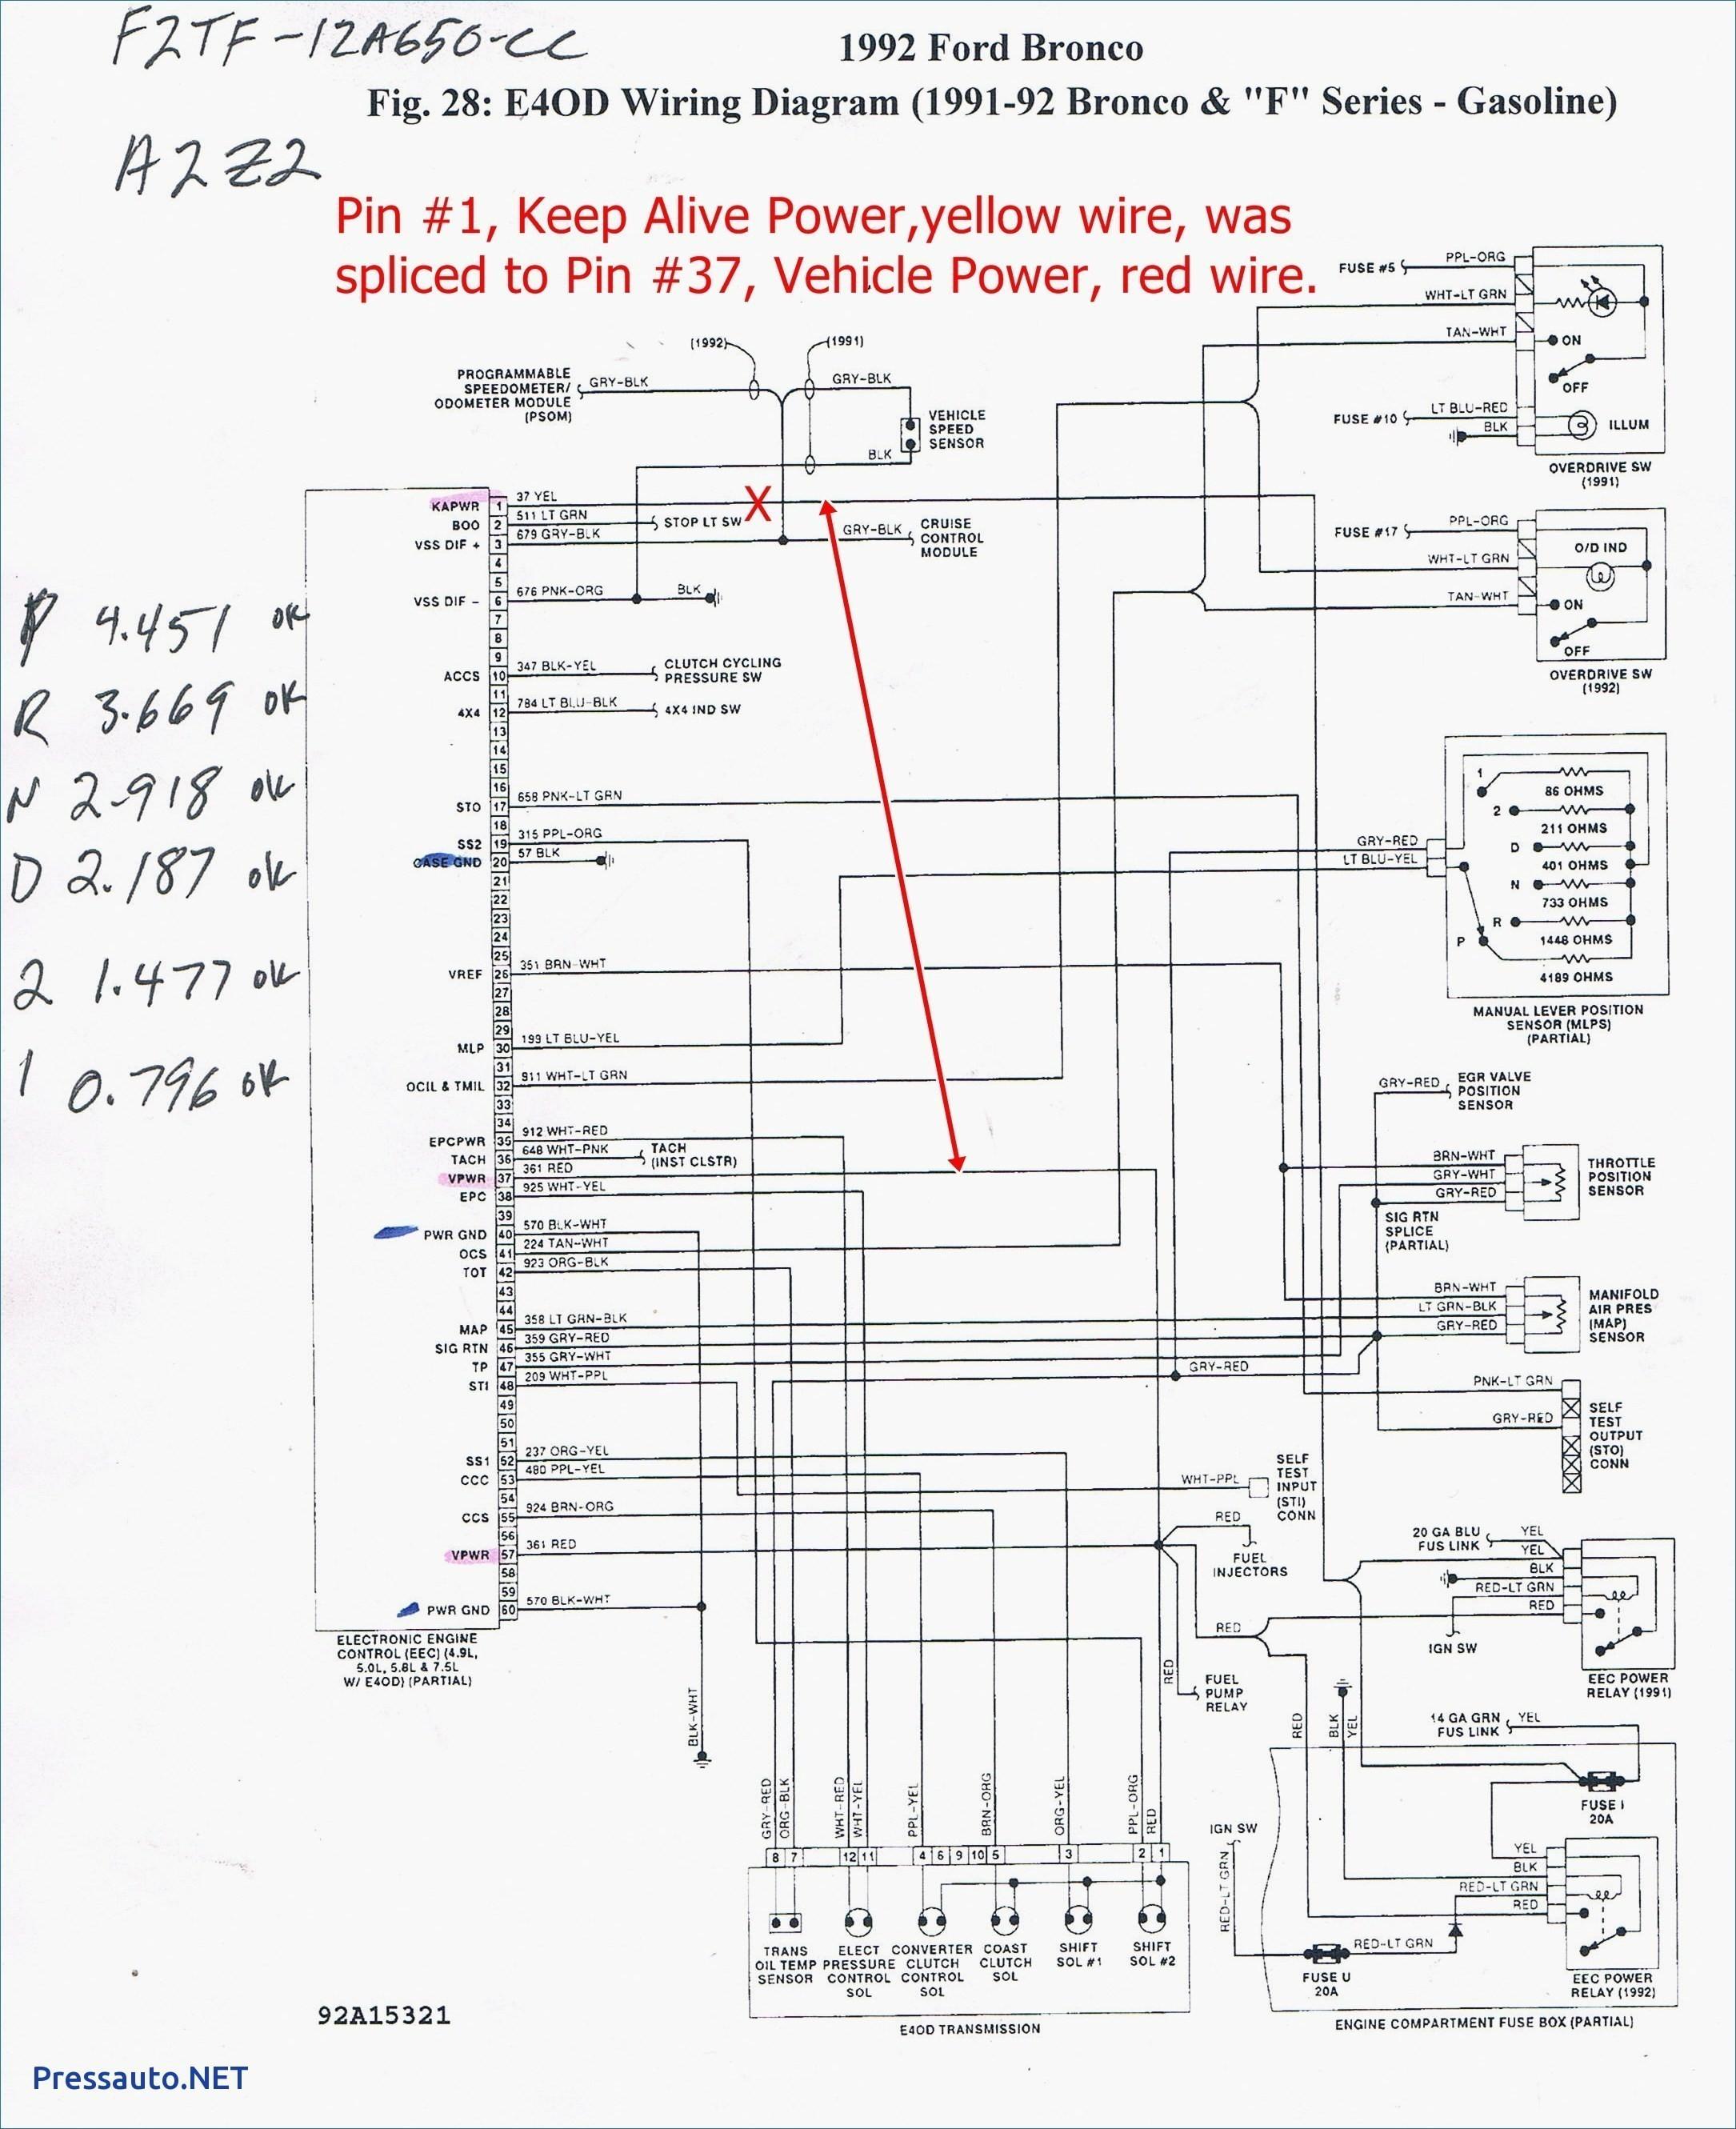 95 dodge ram 1500 wiring diagram 1995 dodge ram 1500 stereo wiring pin diagram wiring diagram data  1995 dodge ram 1500 stereo wiring pin